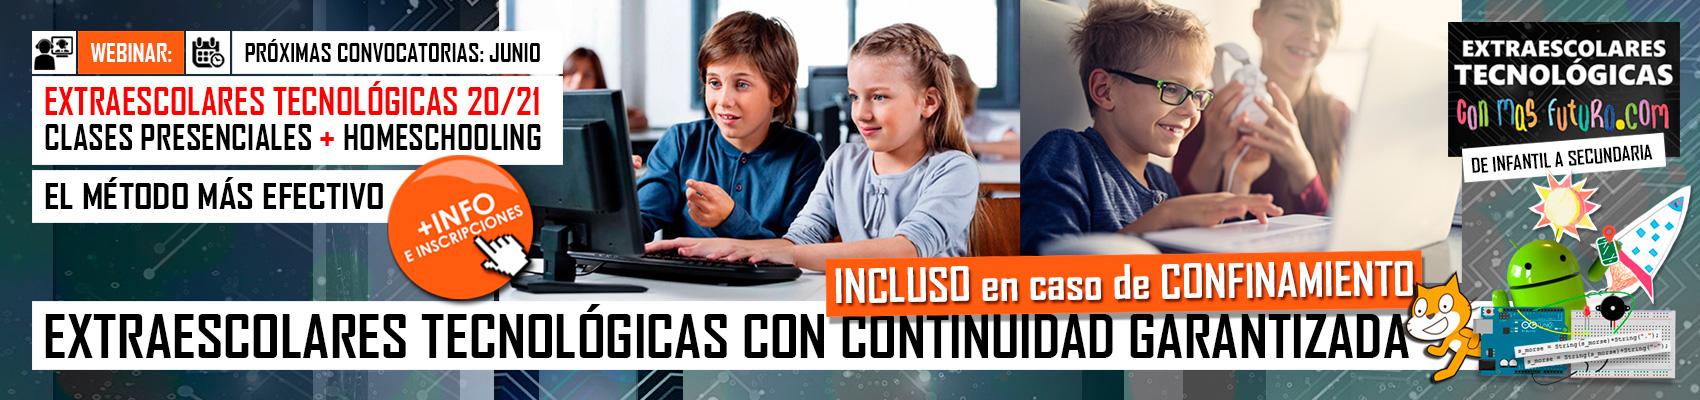 Webinar Extraescolares Tecnológicas ConMasFuturo20/20